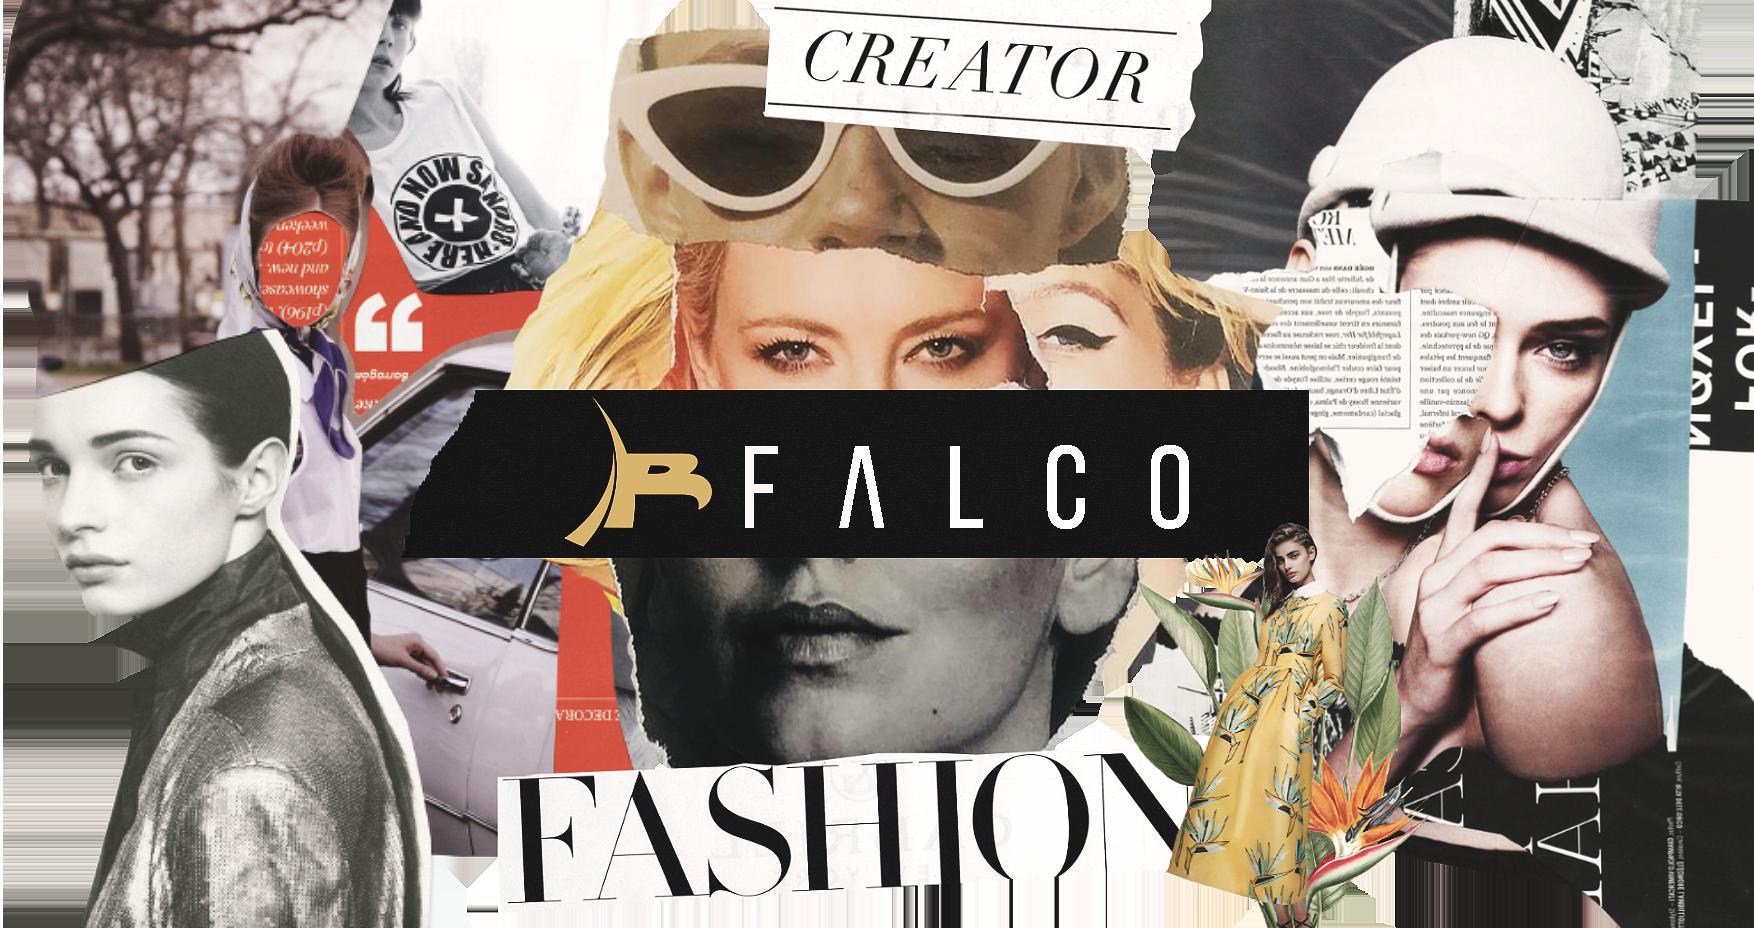 falco-o-nama-kolaz-fotografija-1